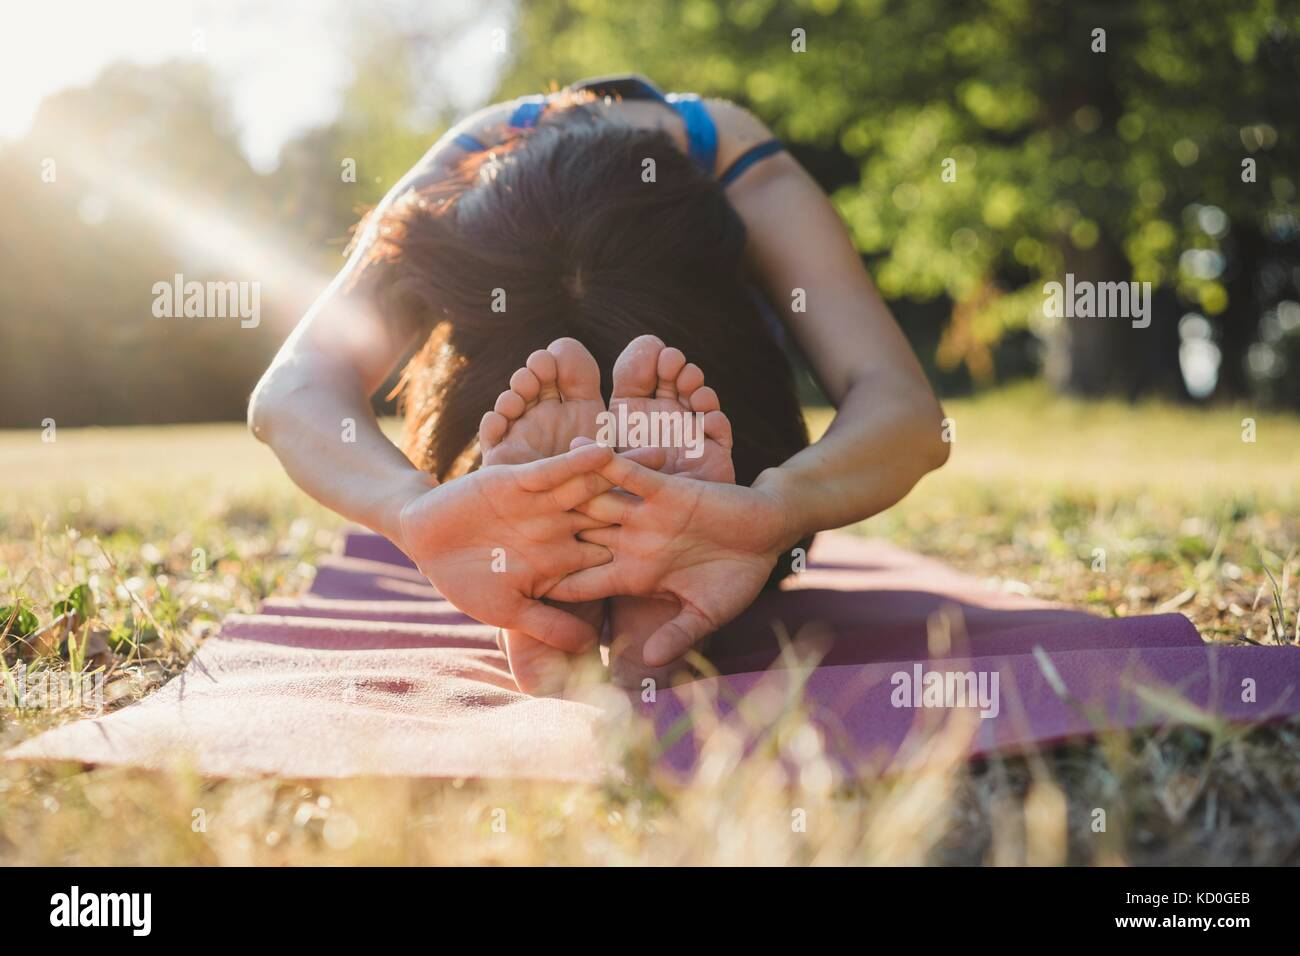 Femme mature dans le parc, assis, stretching, in yoga position Photo Stock